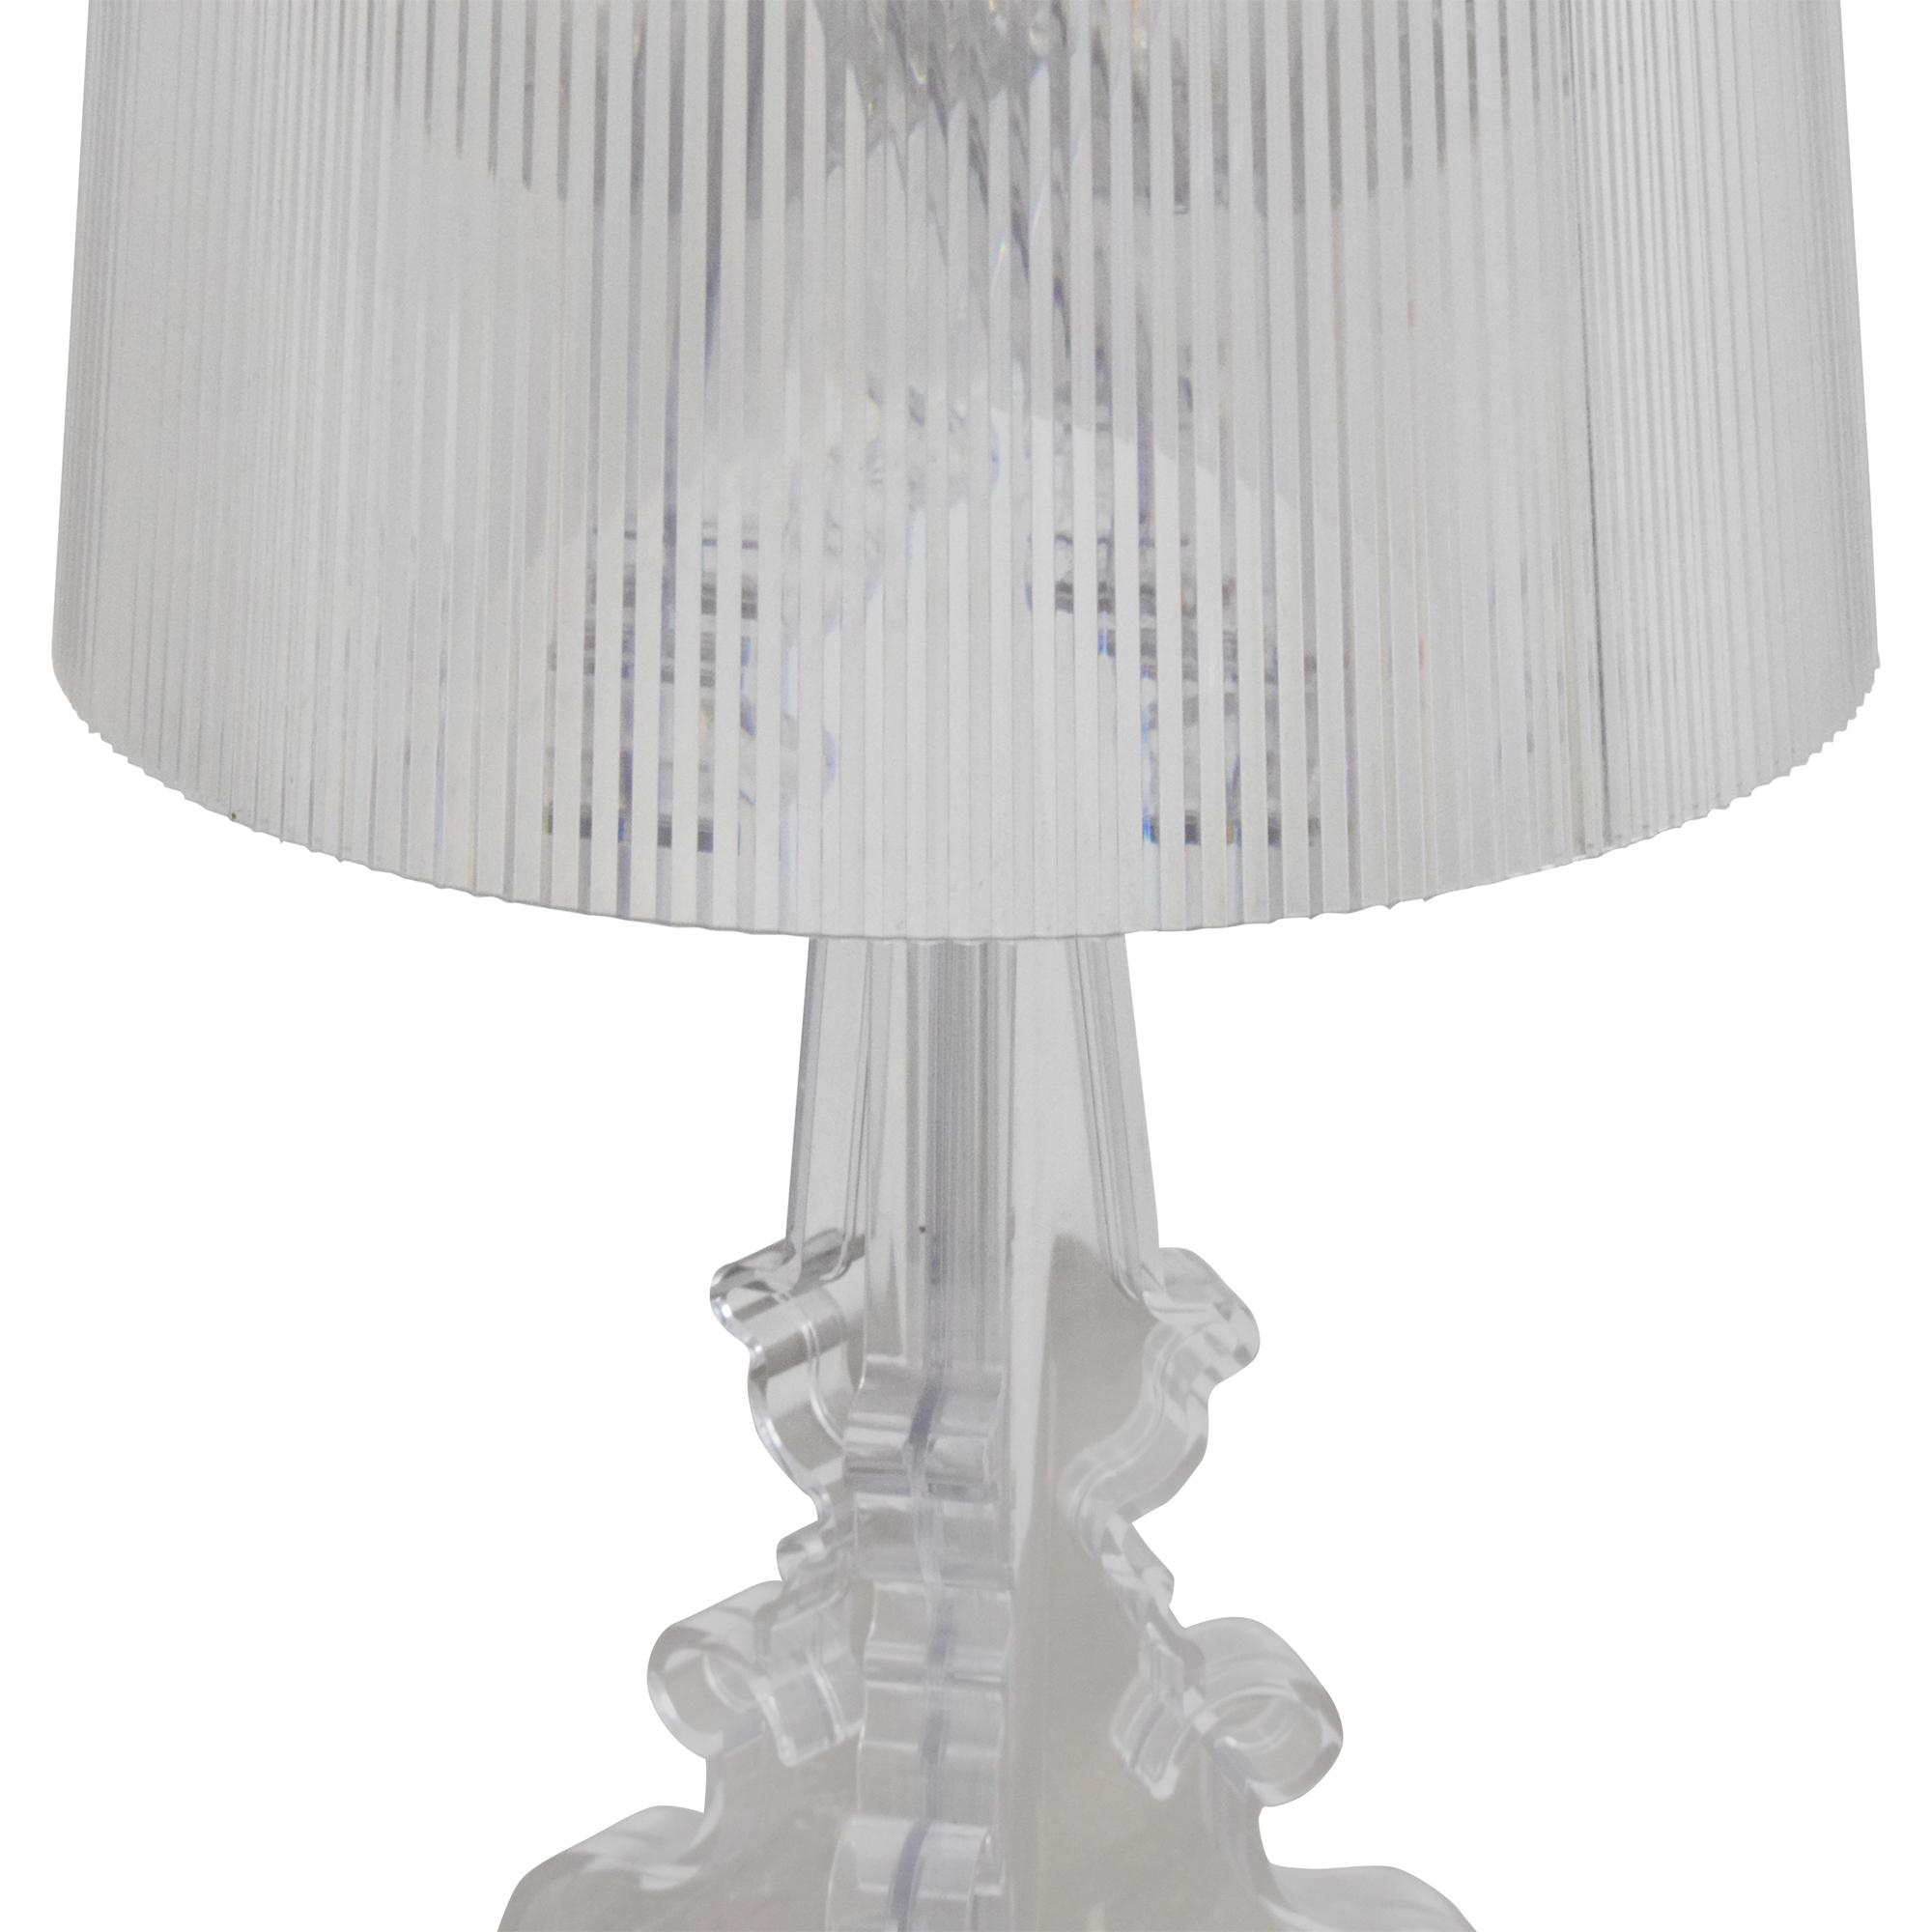 Kartell Kartell Bourgie Table Lamp price